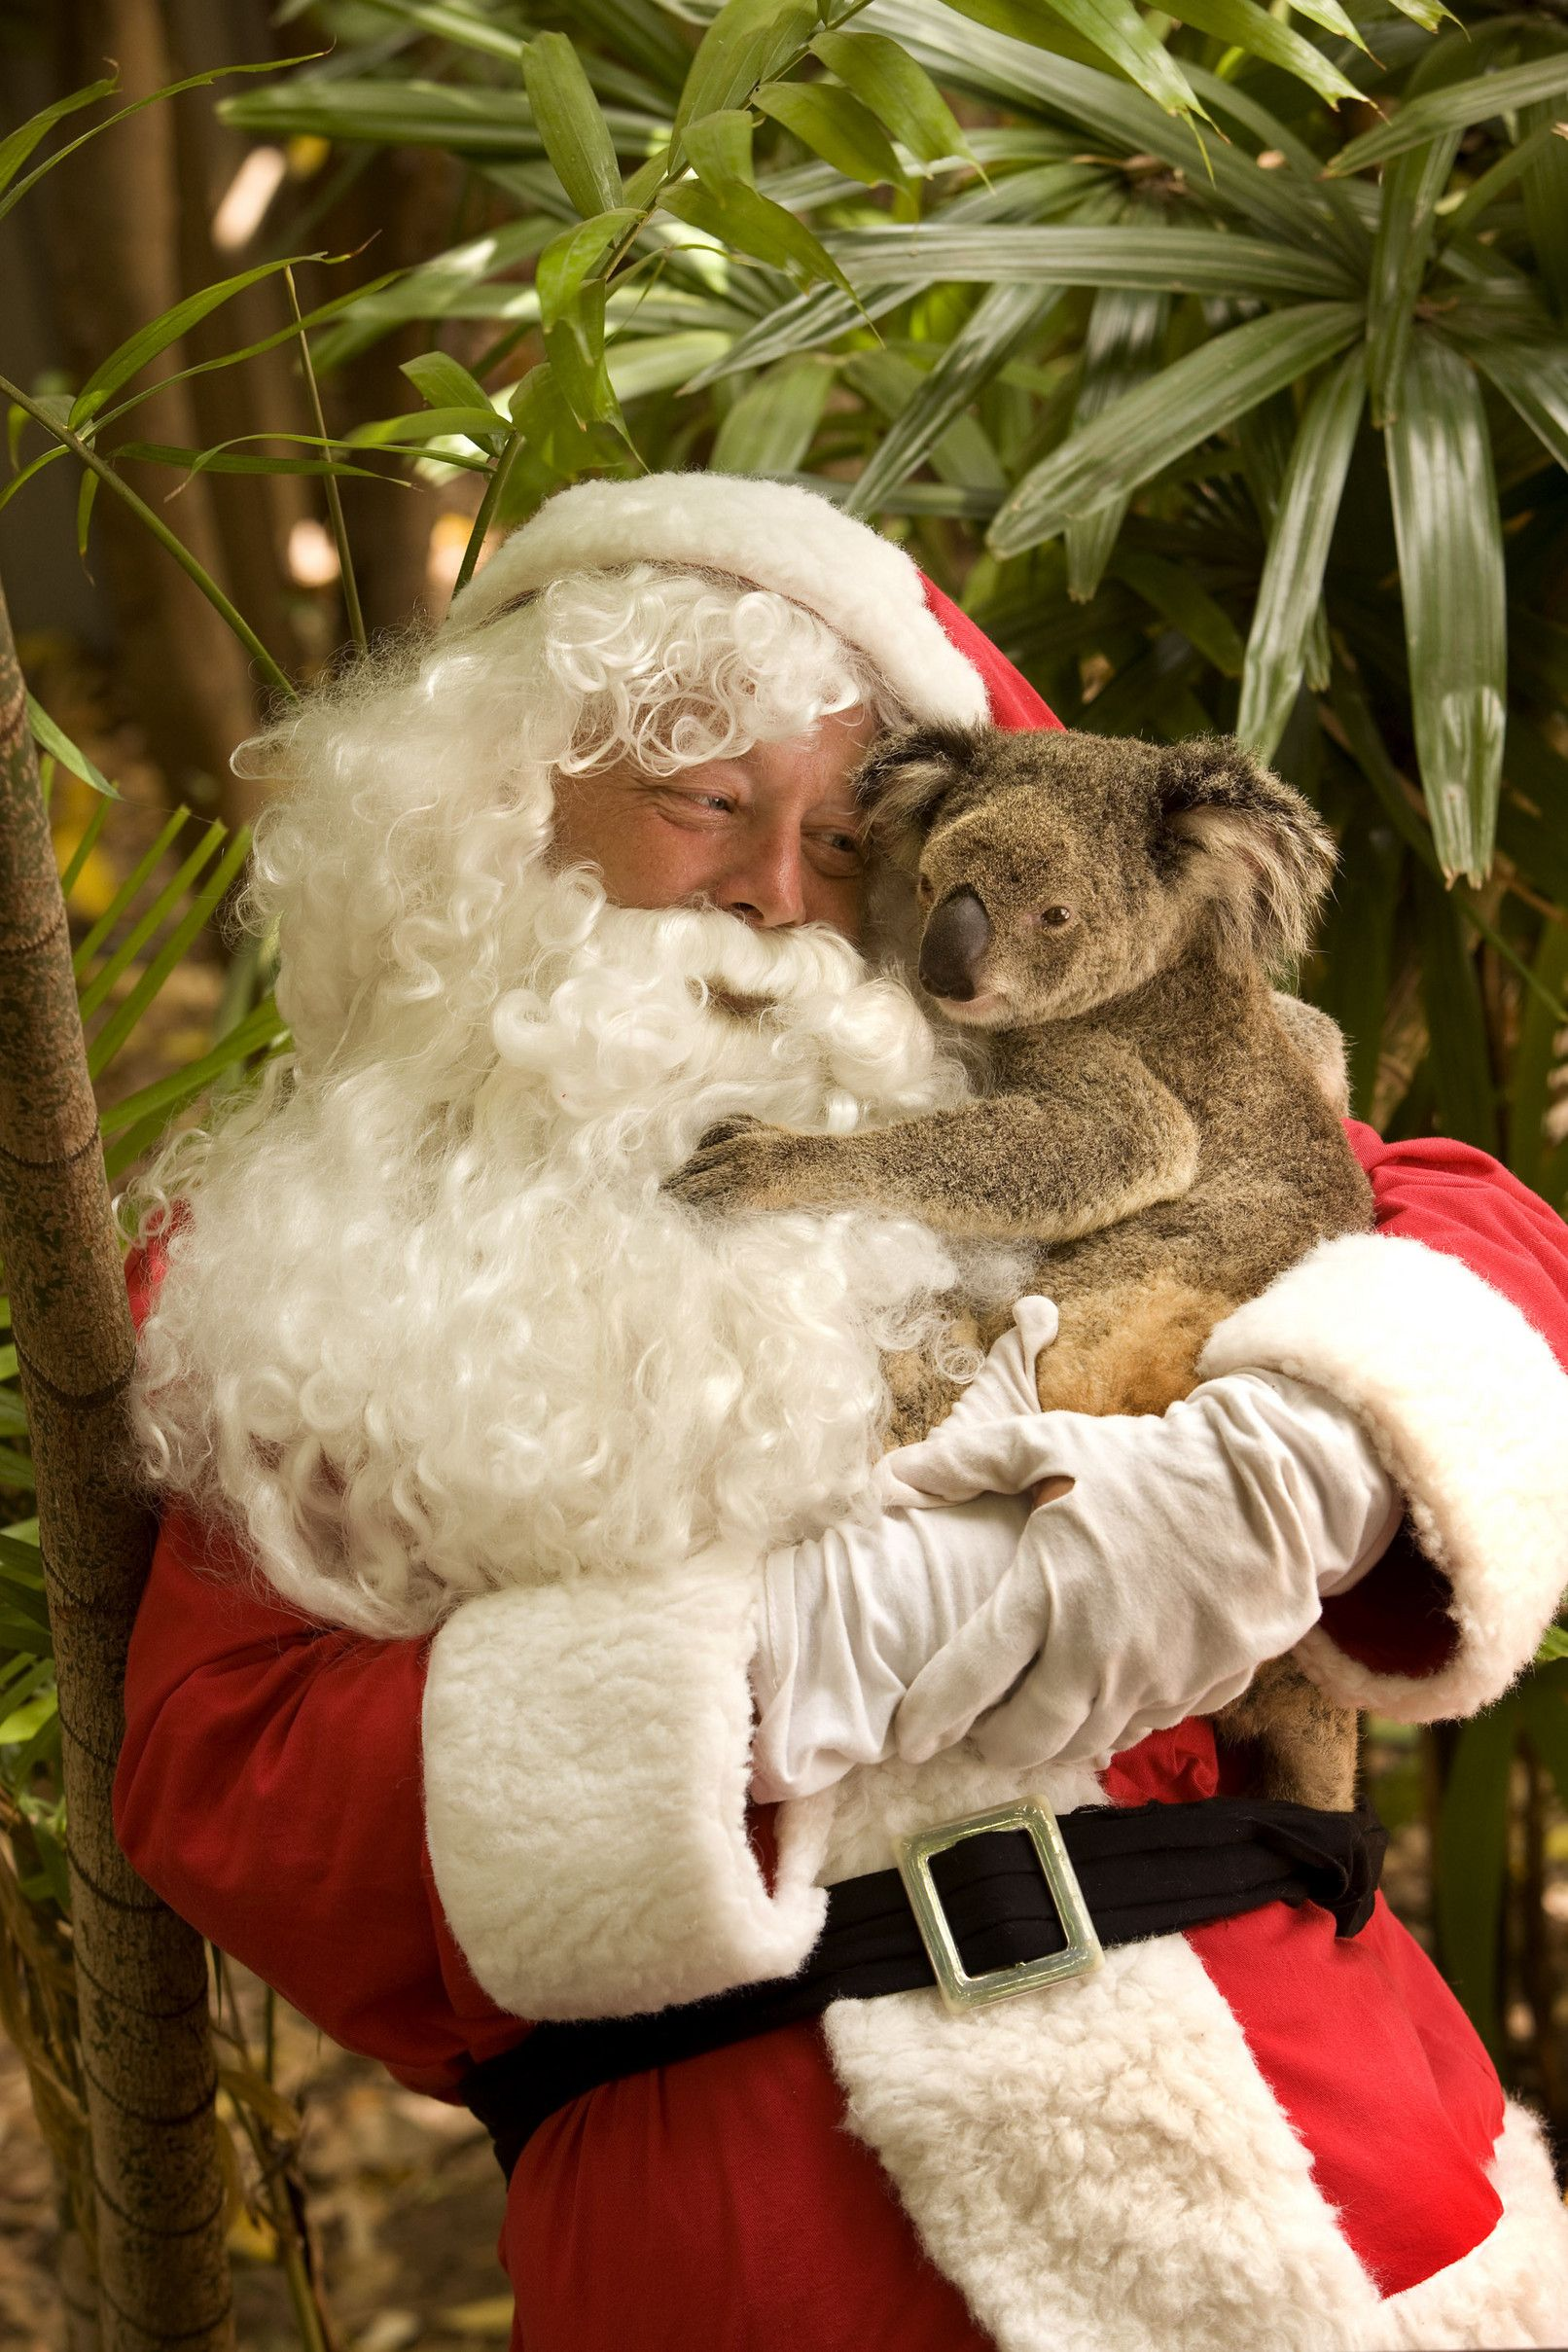 Australia is having their Summer when Christmas arrives. Folklore ...